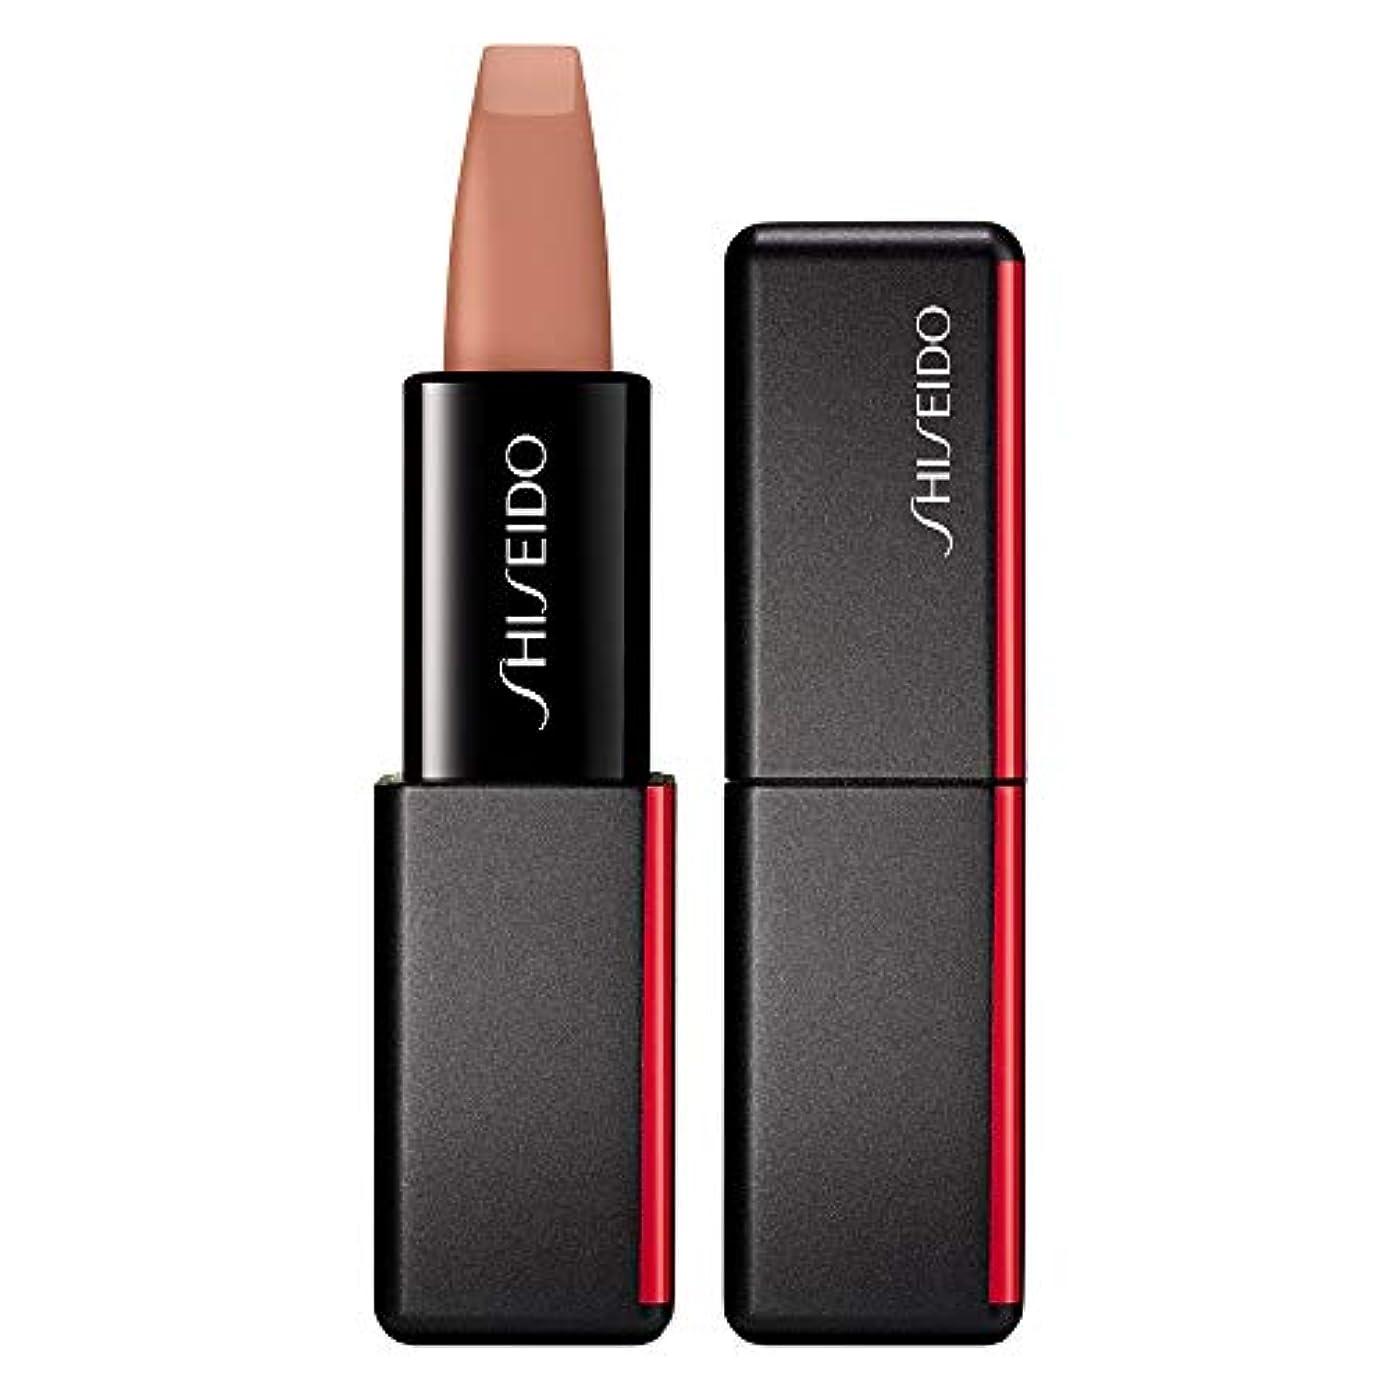 中傷動詞重量資生堂 ModernMatte Powder Lipstick - # 502 Whisper (Nude Pink) 4g/0.14oz並行輸入品